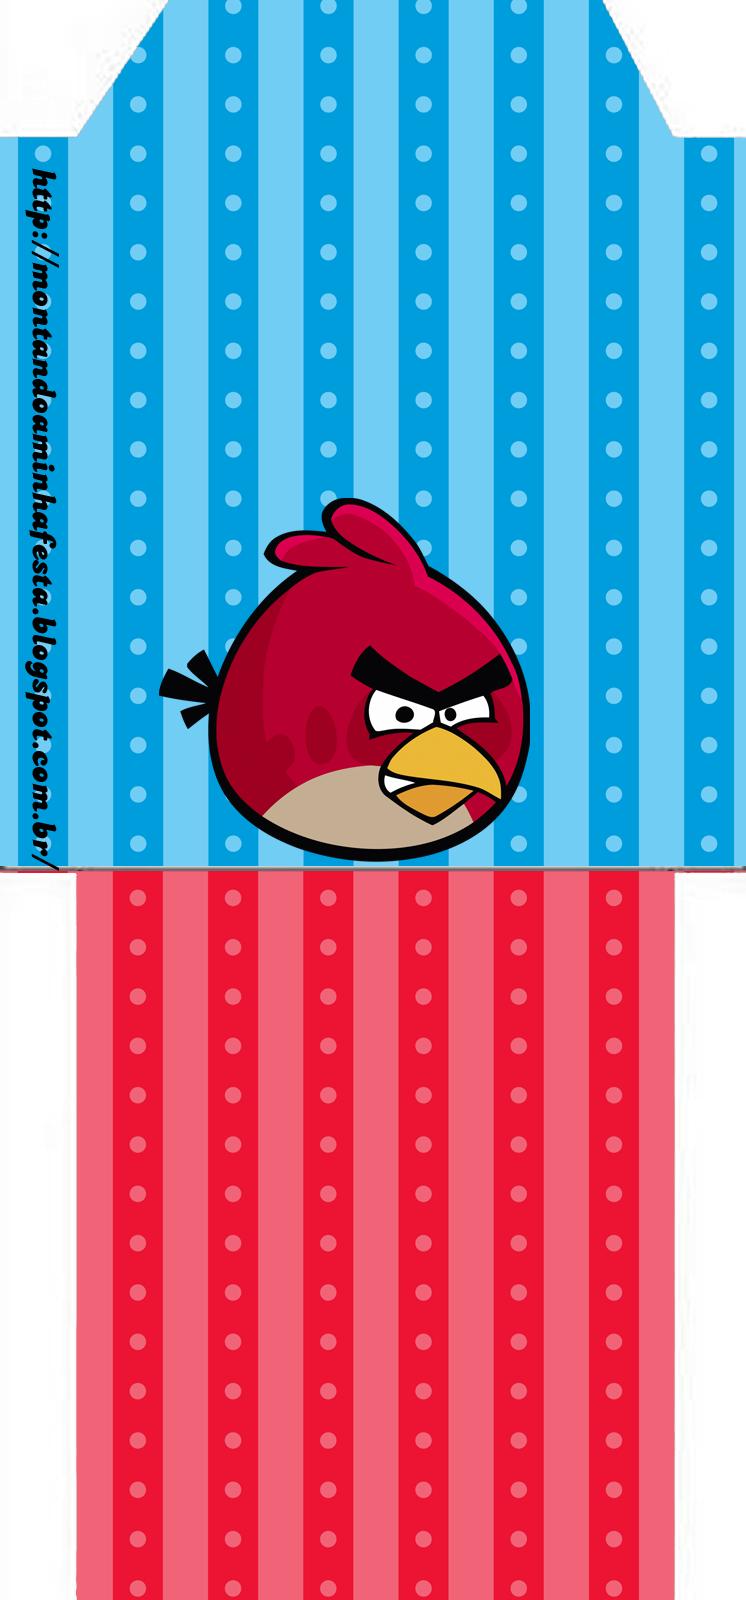 Bolsita de Té para imprimir gratis de Cumpleaños de Angry Birds.